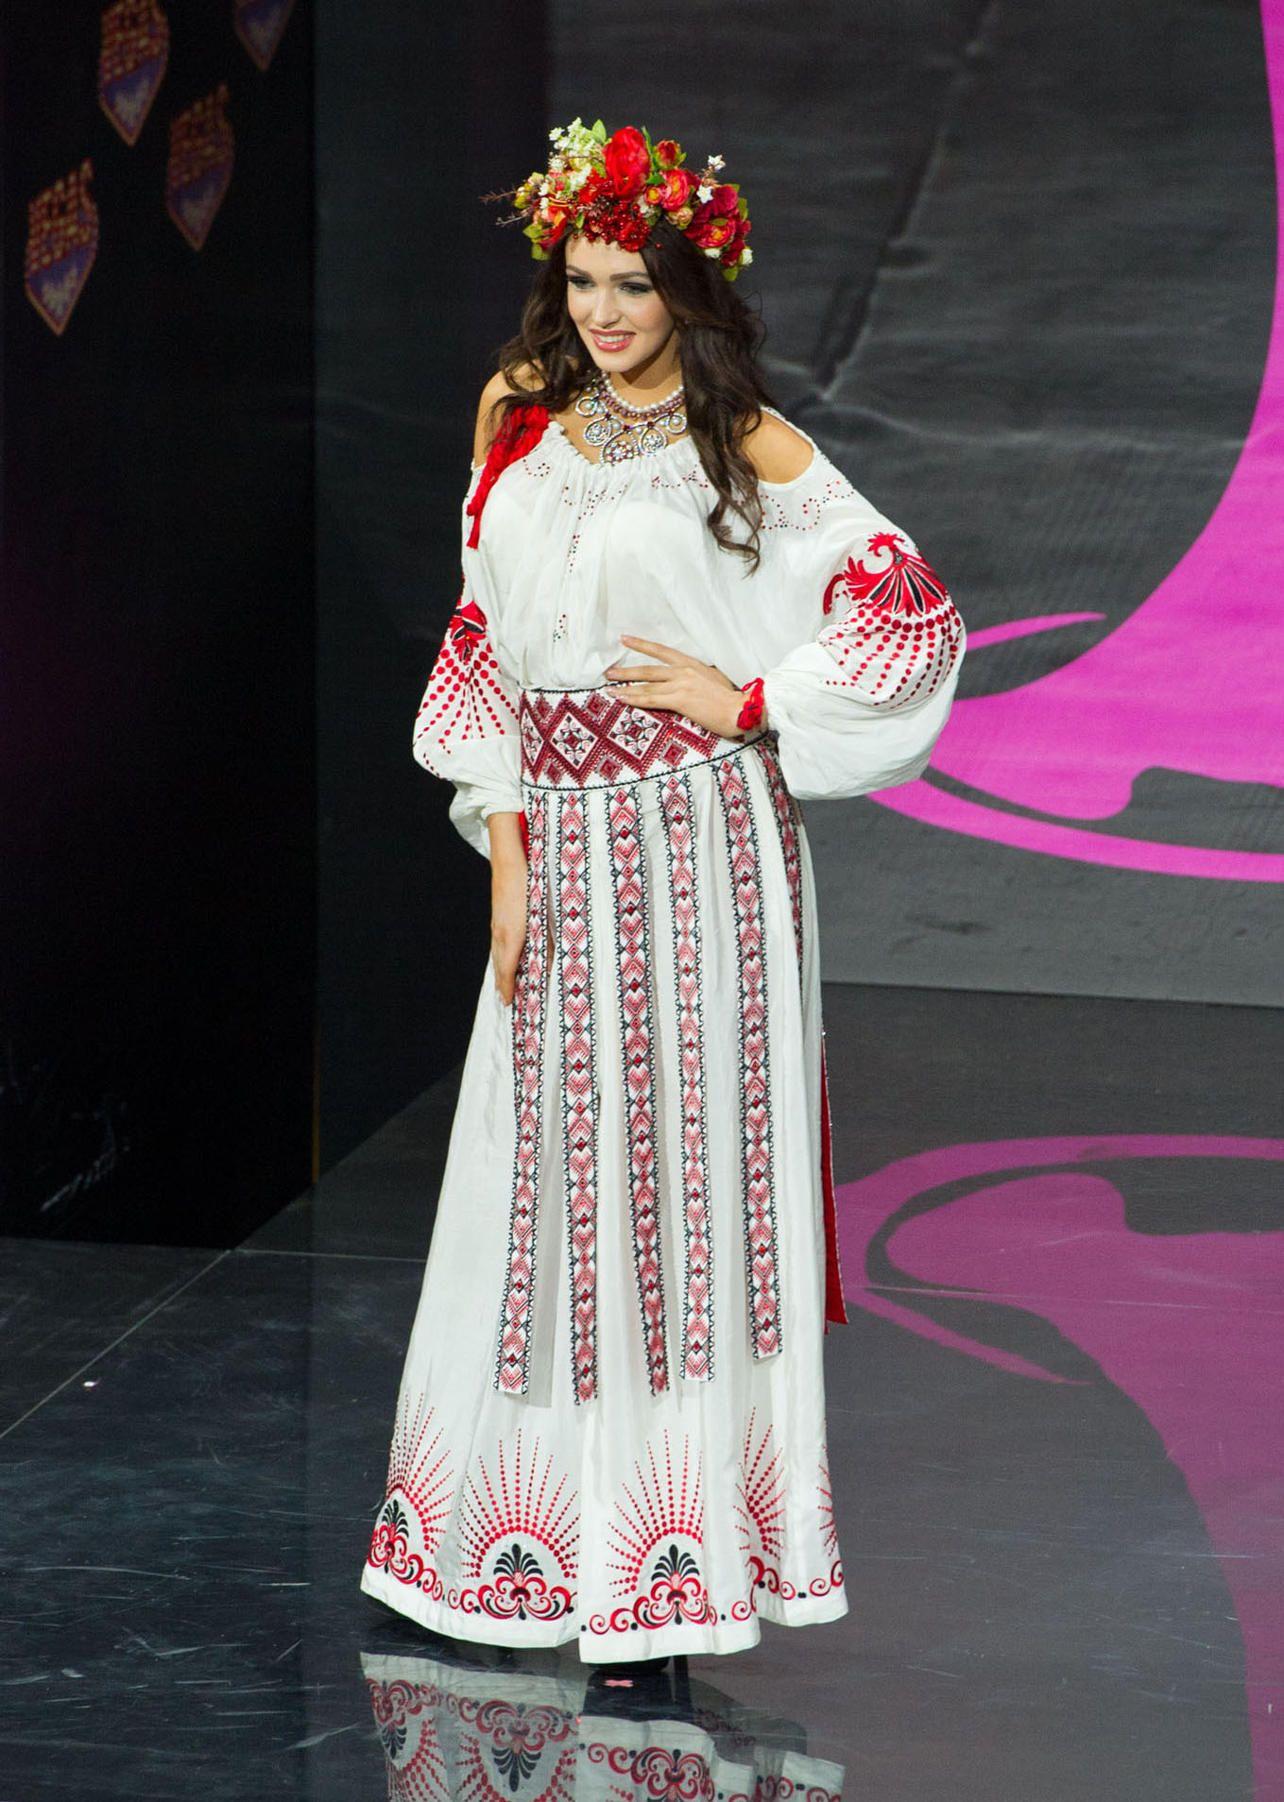 2013MISS UNIVERSE NATIONAL COSTUME CONTEST MISS UKRAINE